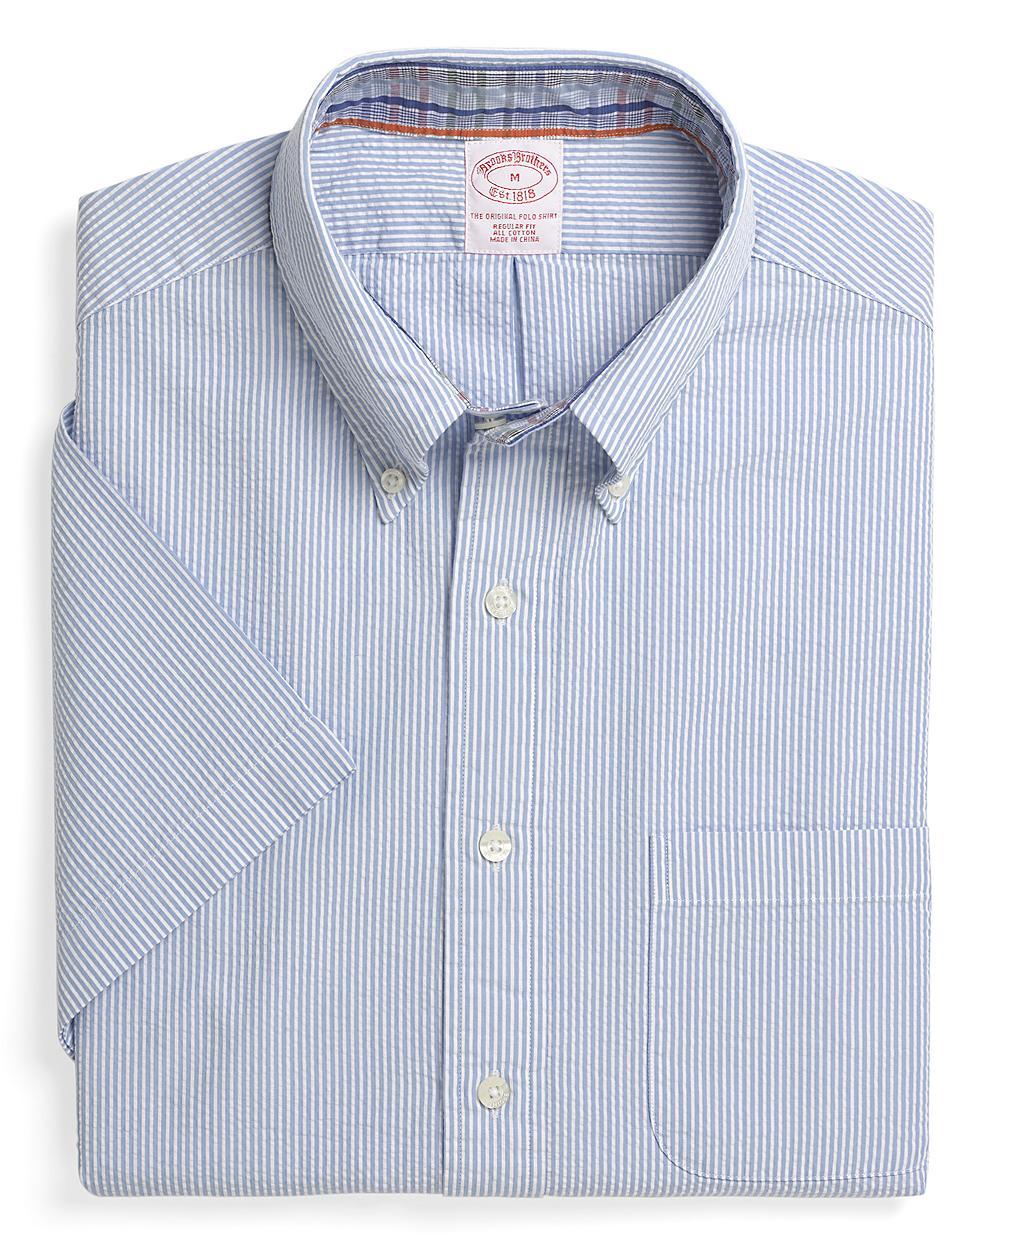 Brooks brothers regular fit short sleeve stripe seersucker Brooks brothers shirt size guide